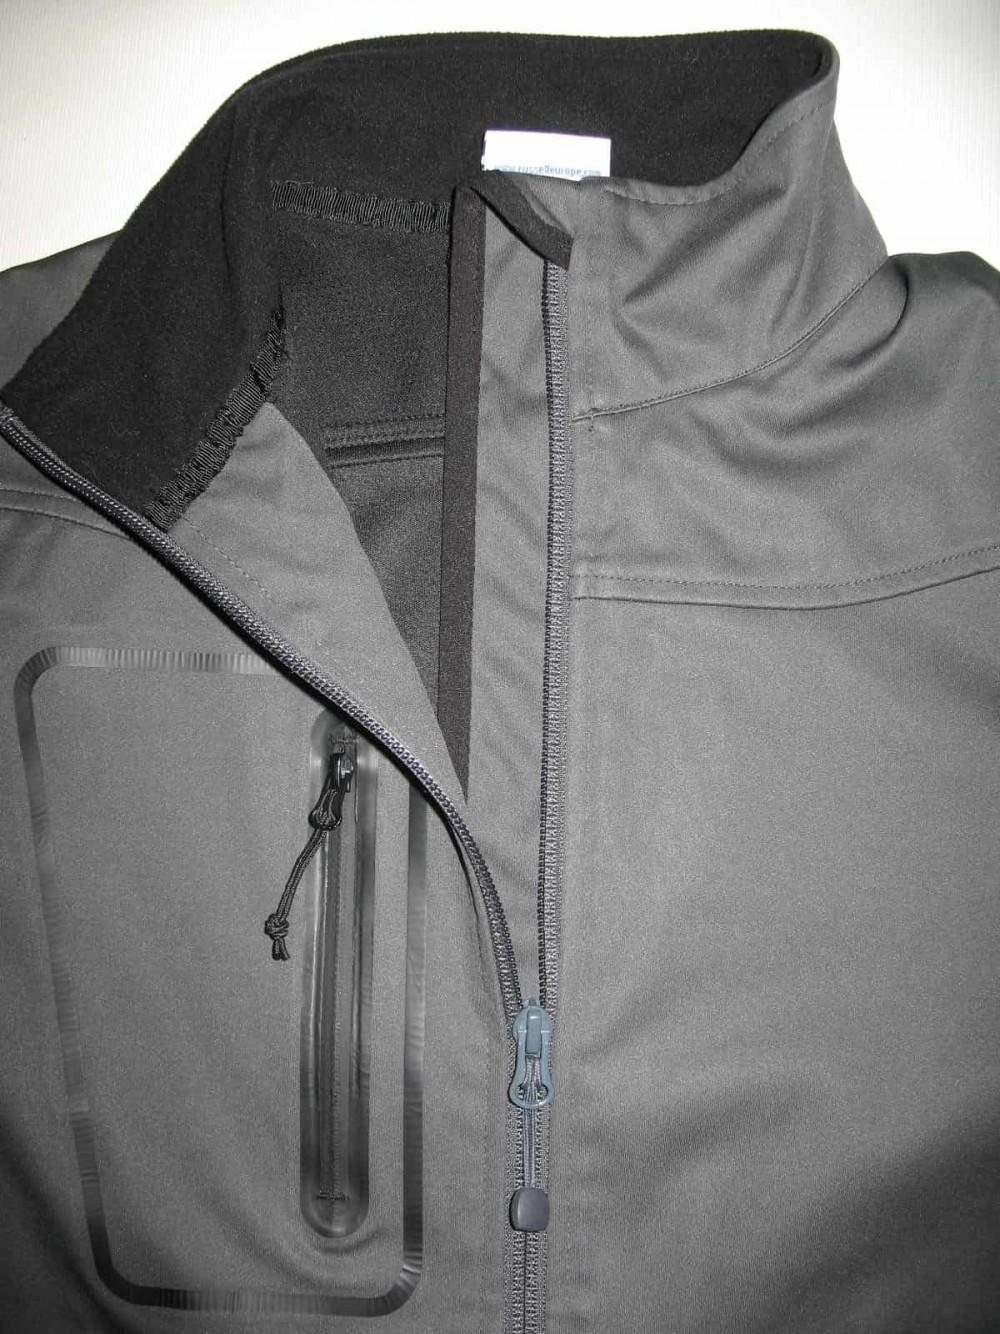 Куртка RUSSELL softshell 5000 jacket lady (размер L) - 3